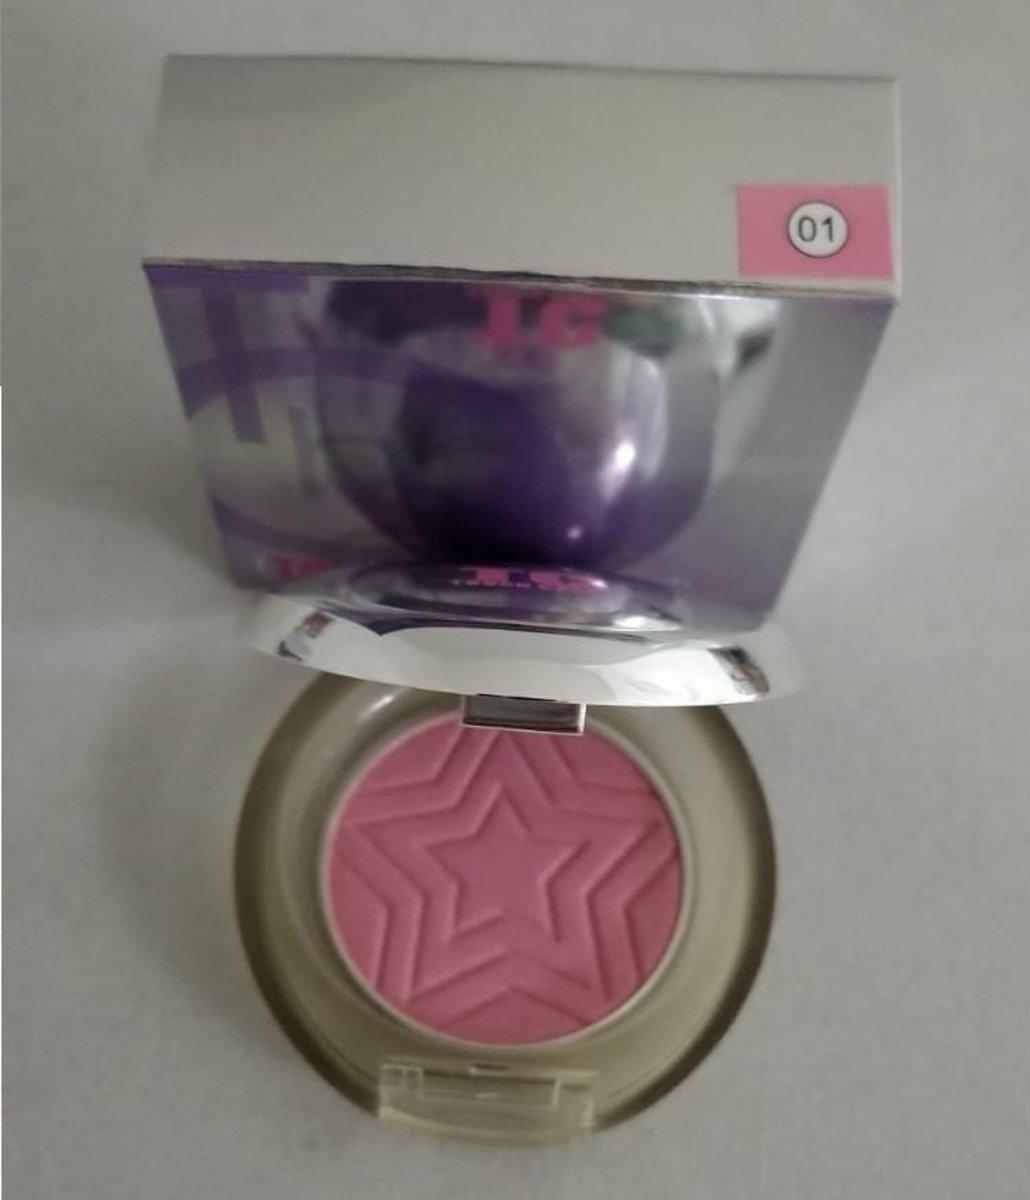 Touch Color Single Blush Powder #01